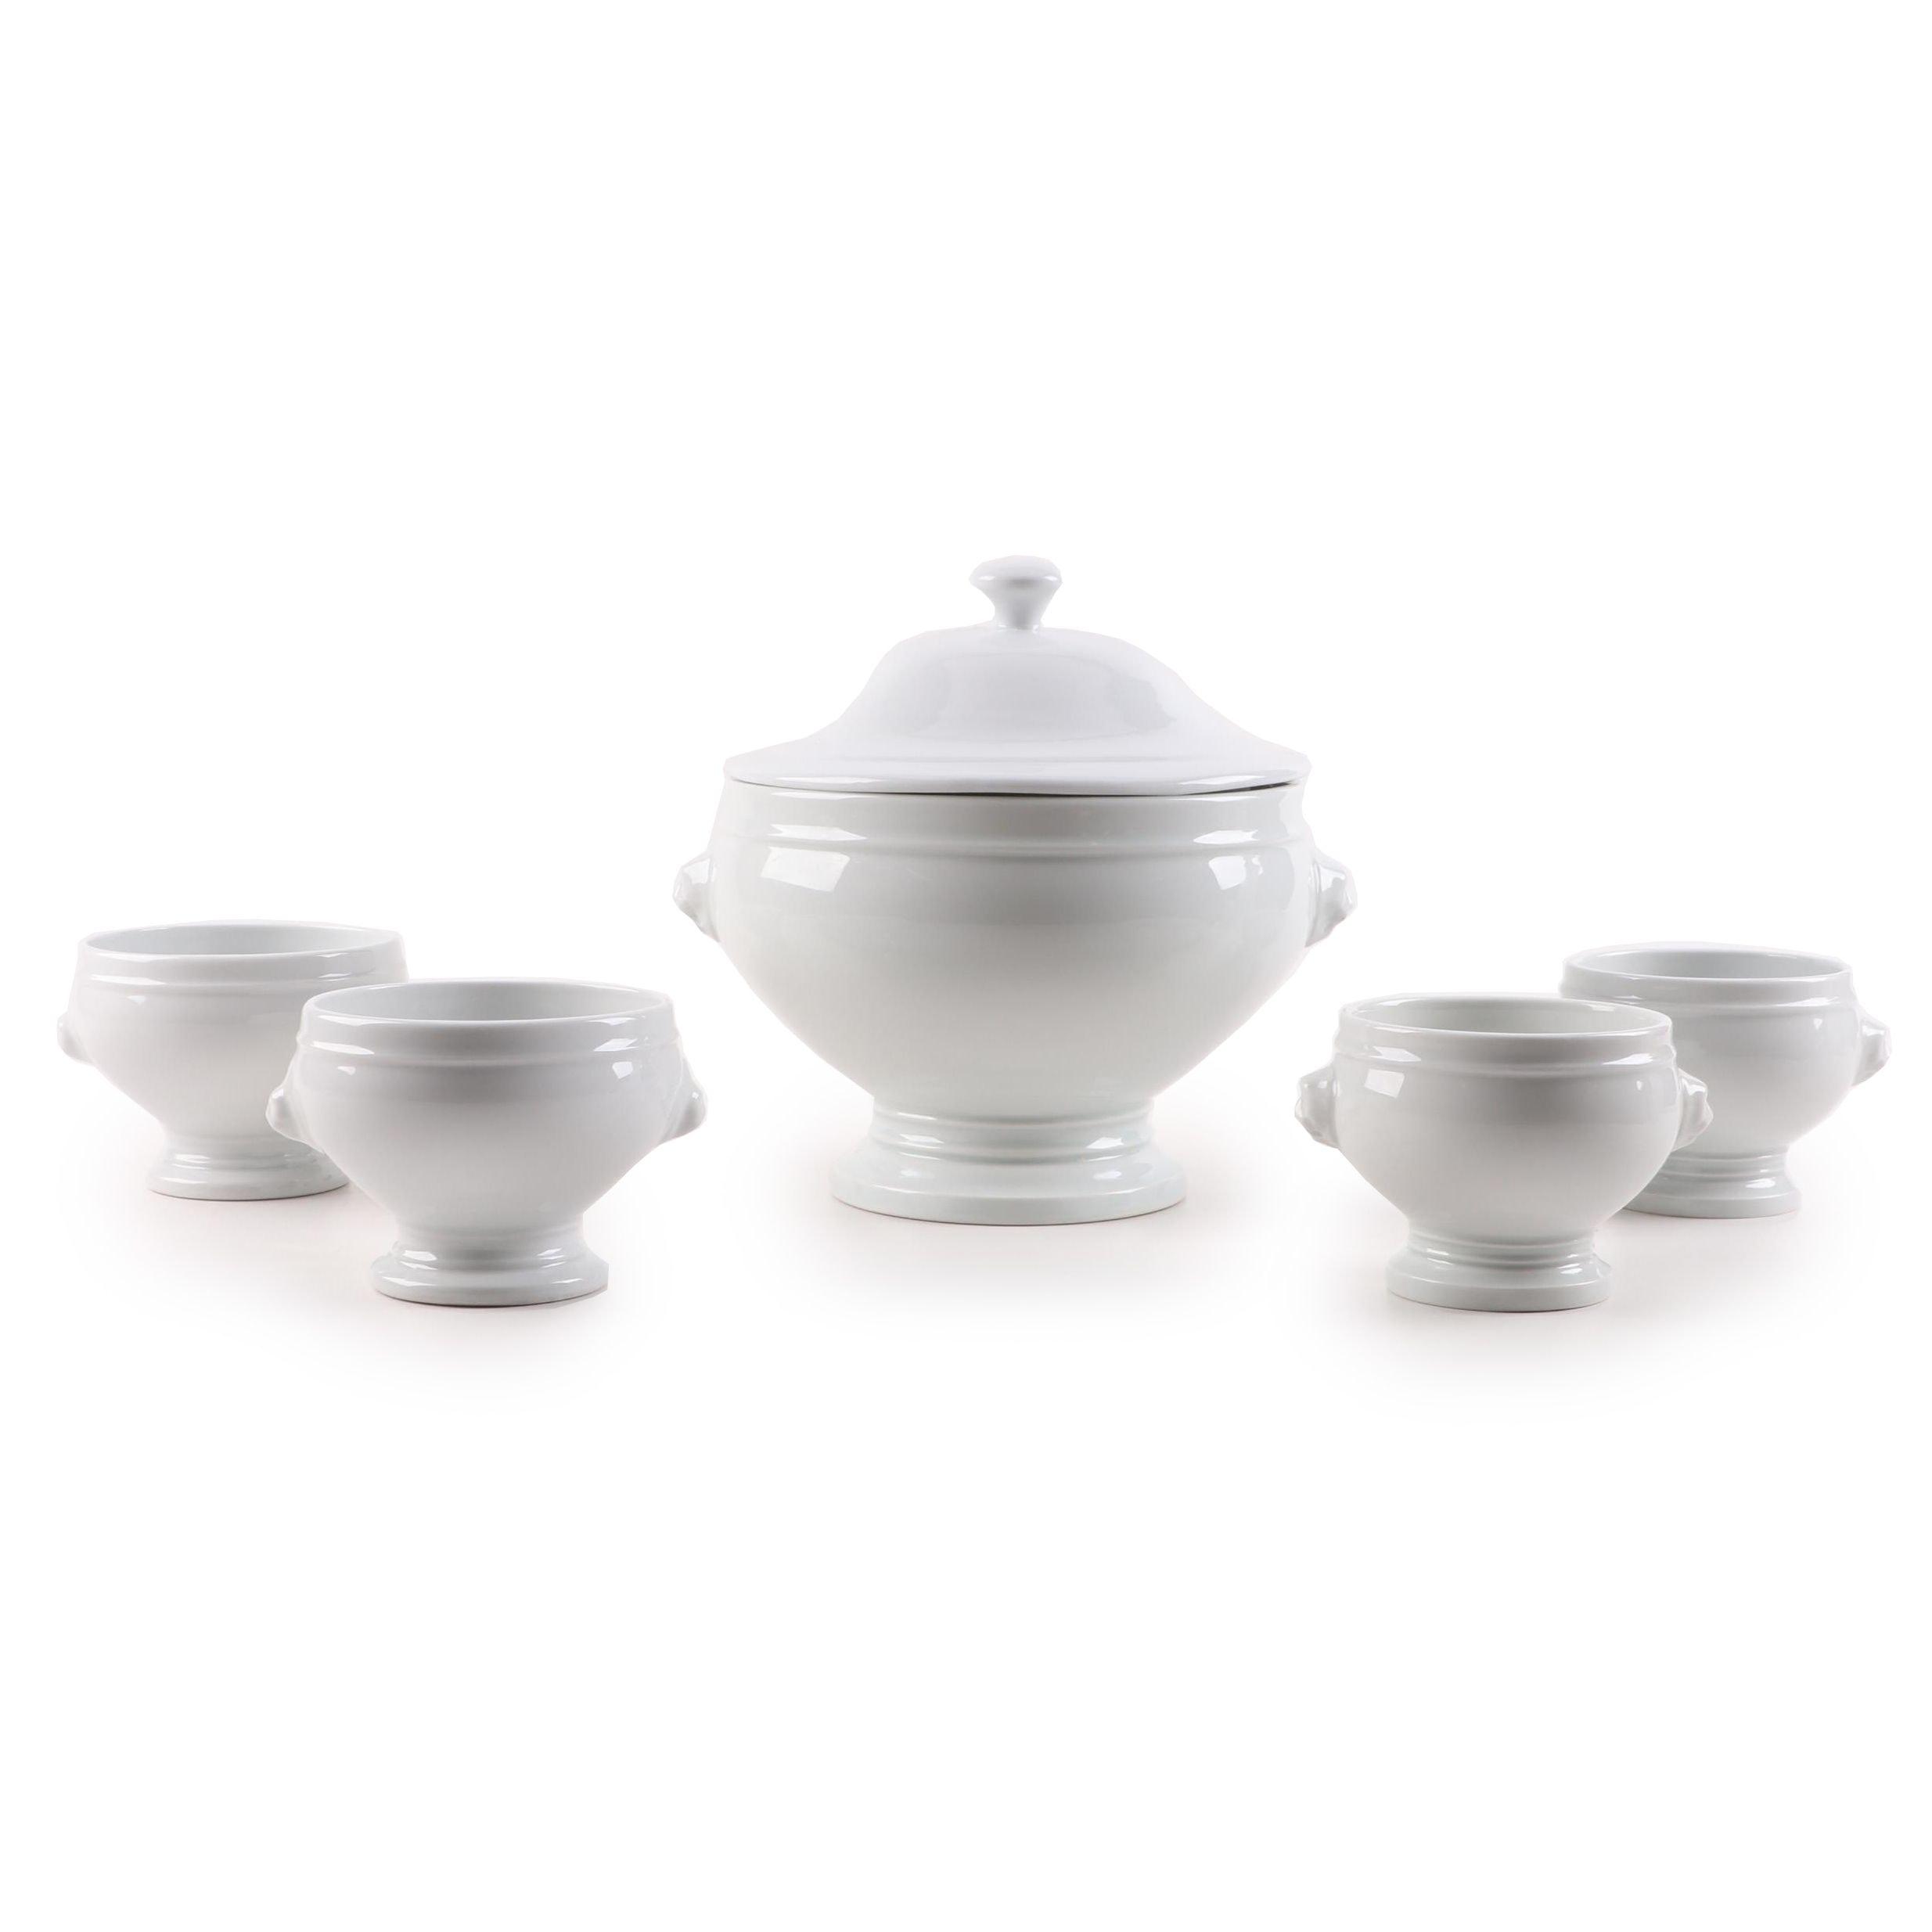 Pillivuyt Porcelain Soup Tureen and Bowls